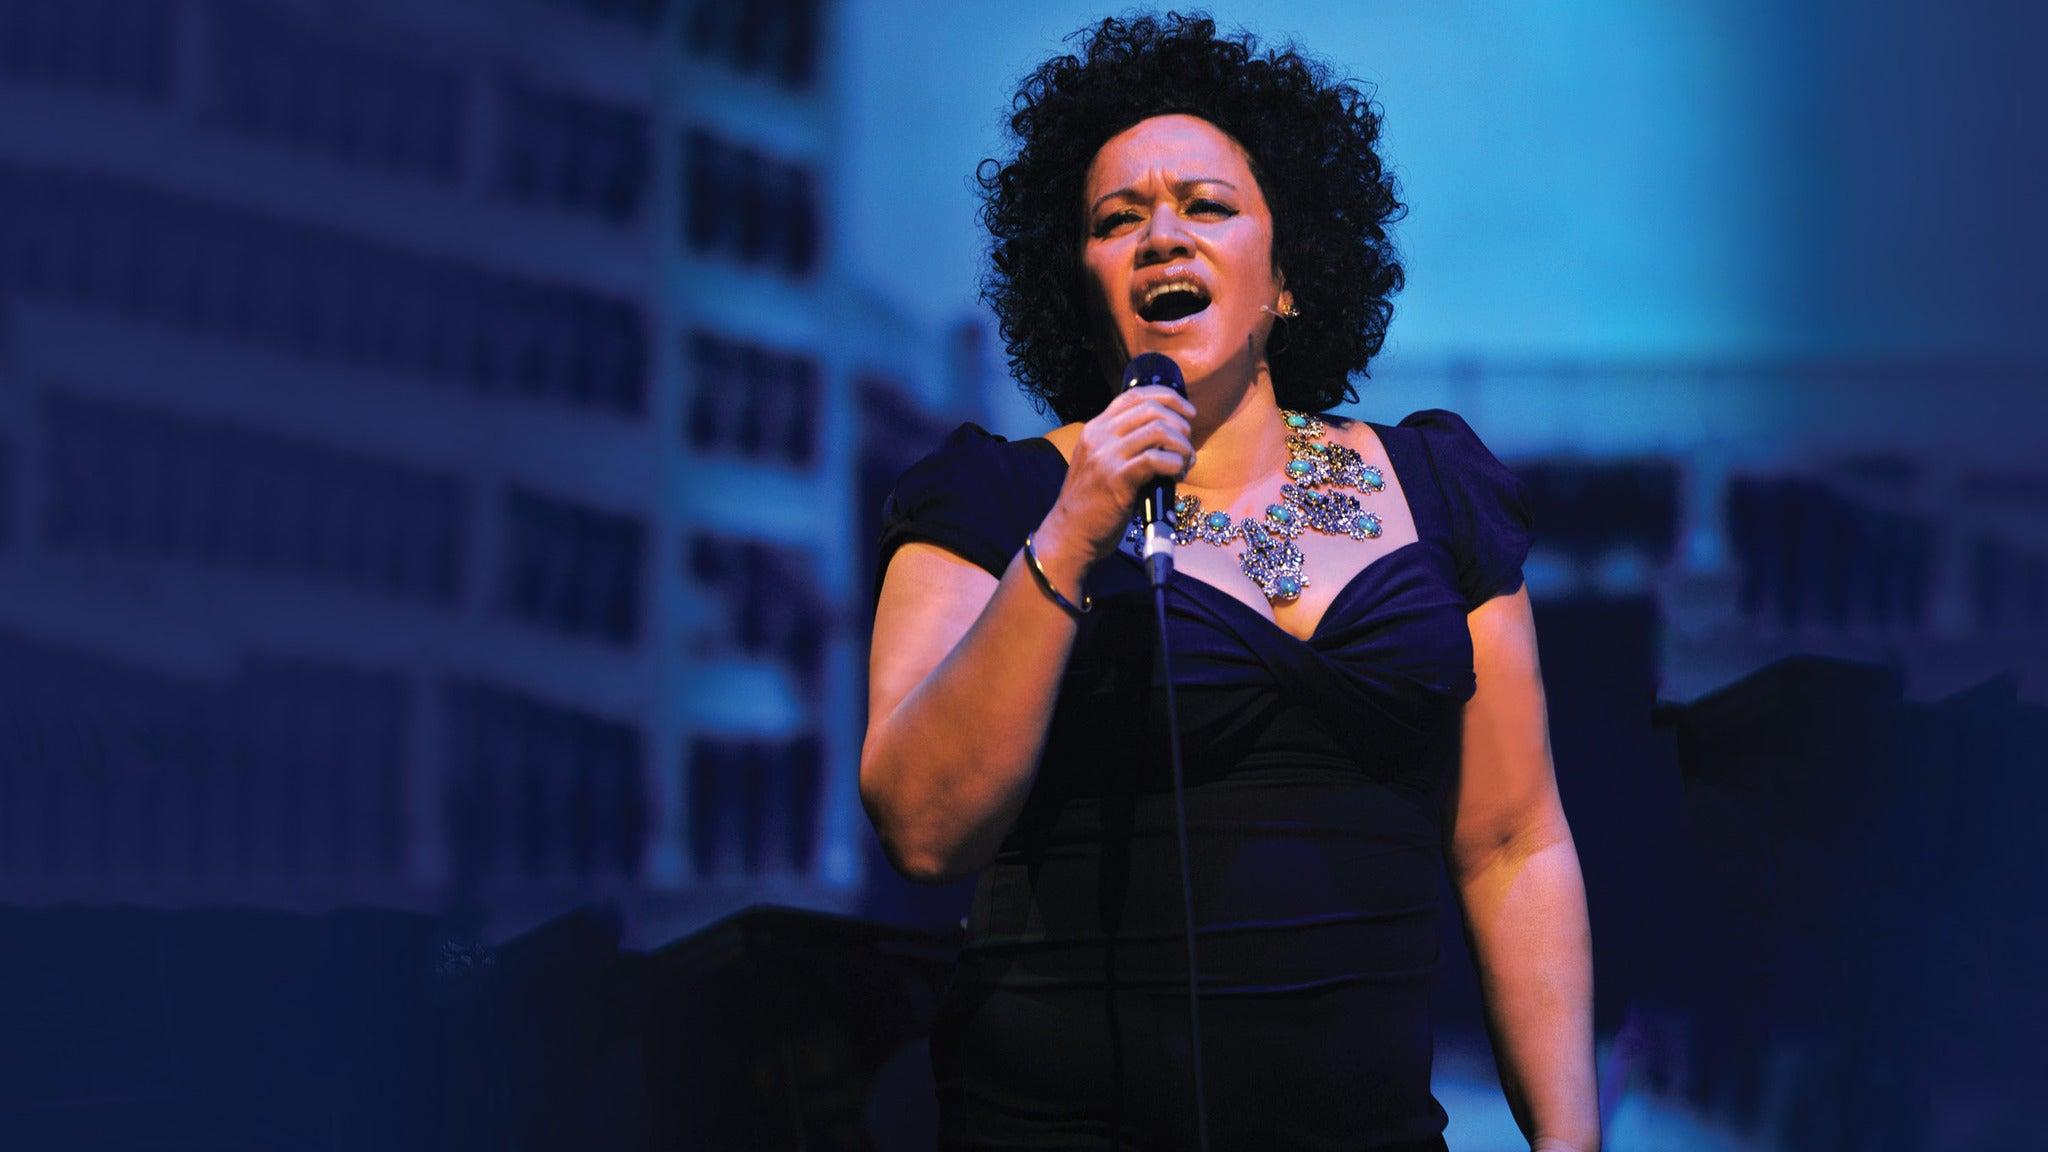 At Last - the Etta James Story